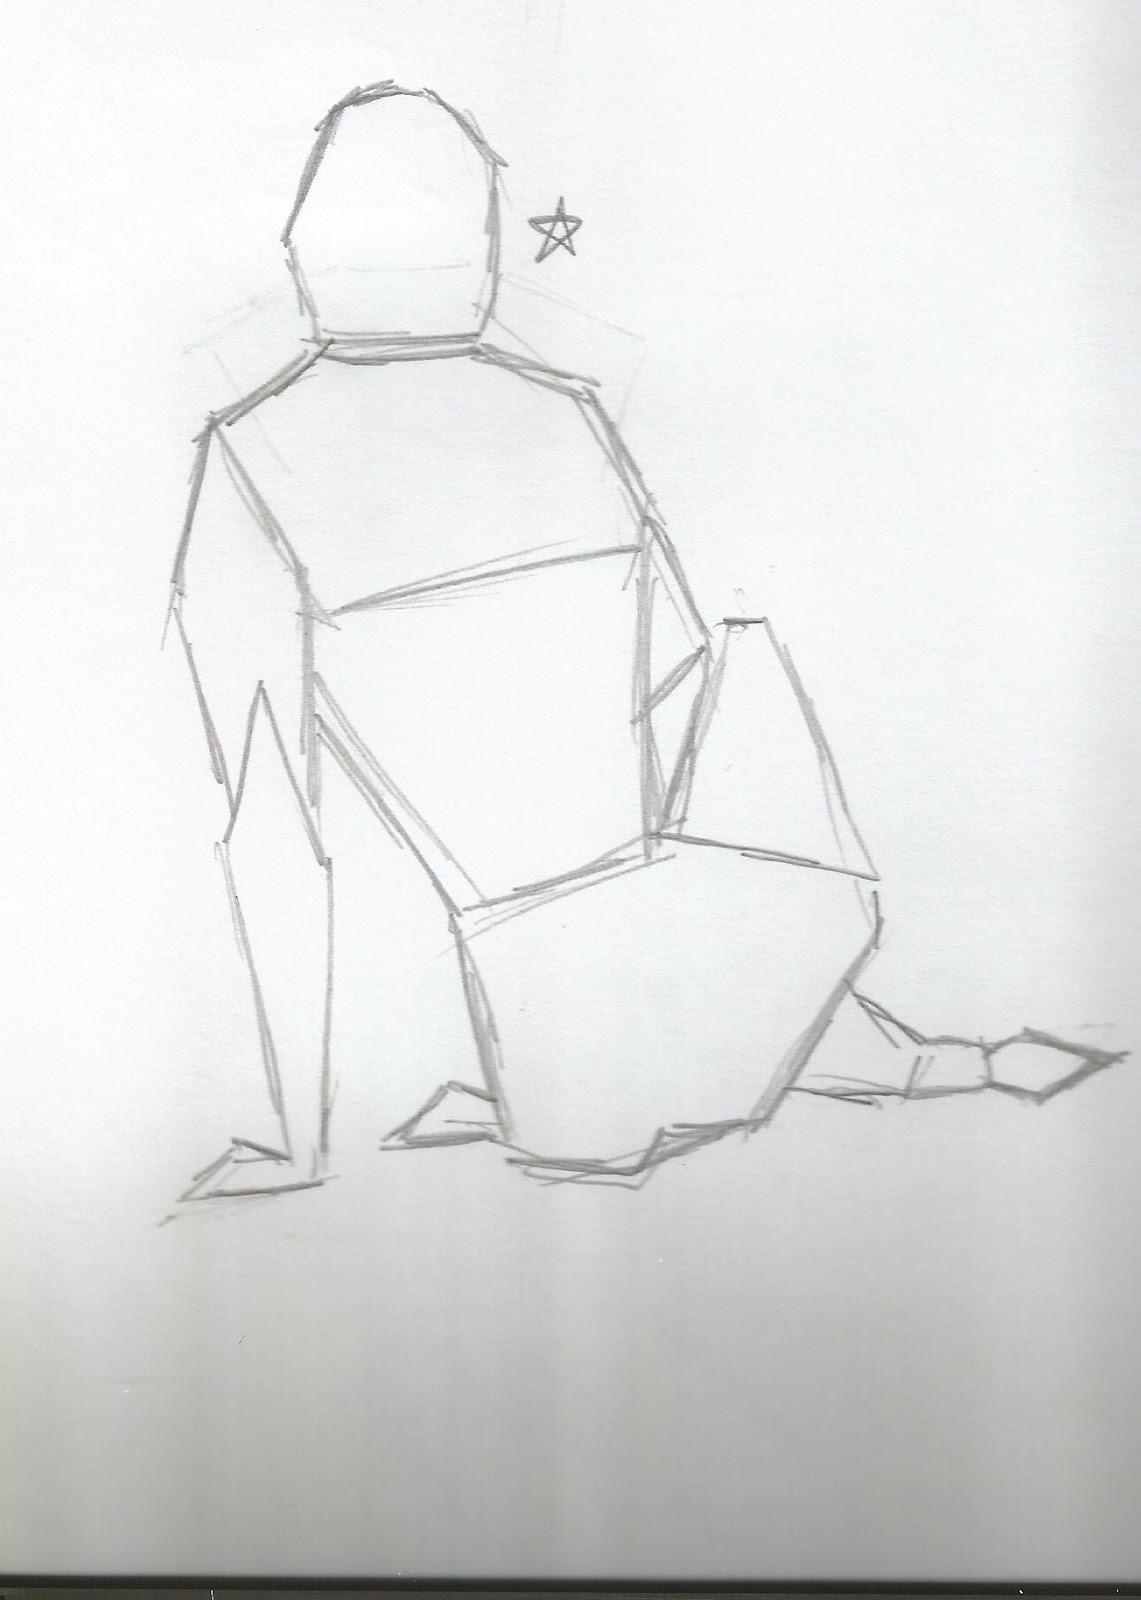 Geometric Life Drawing Drawing Visualization Still